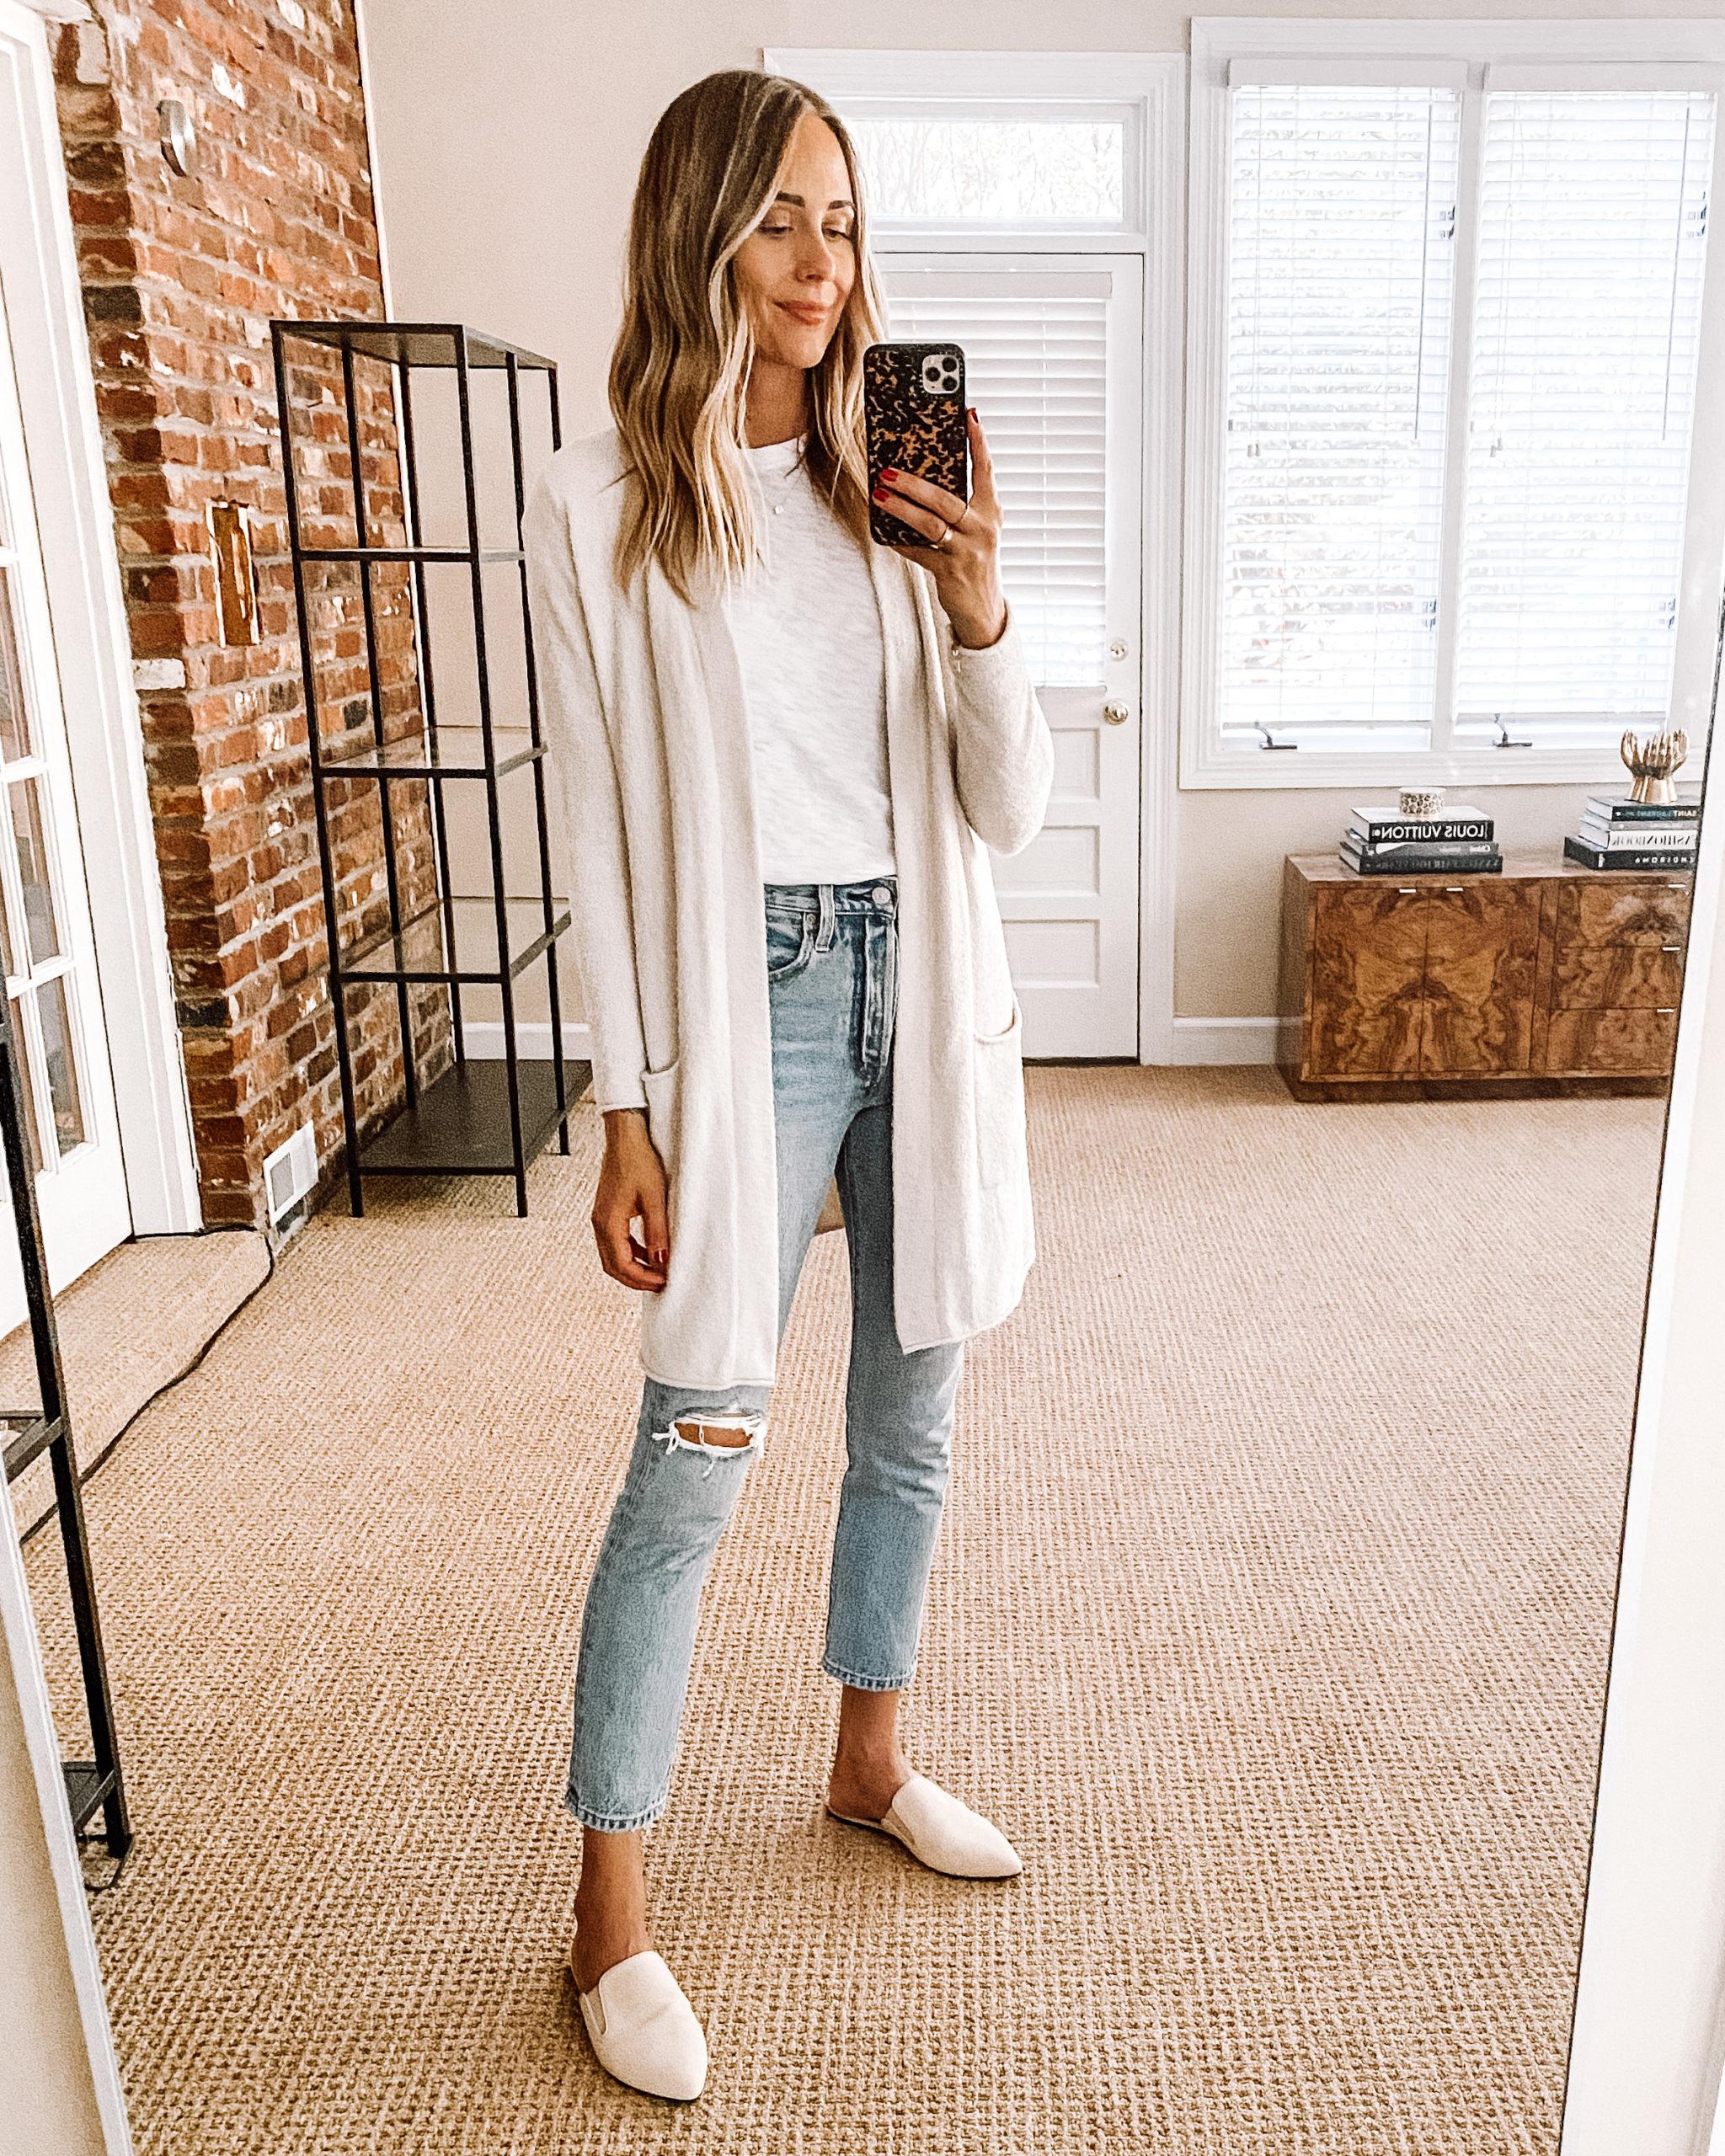 Fashion Jackson Nordstrom Anniversary Sale Barefoot Dreams Cardigan White Tshirt White Ripped Jeans